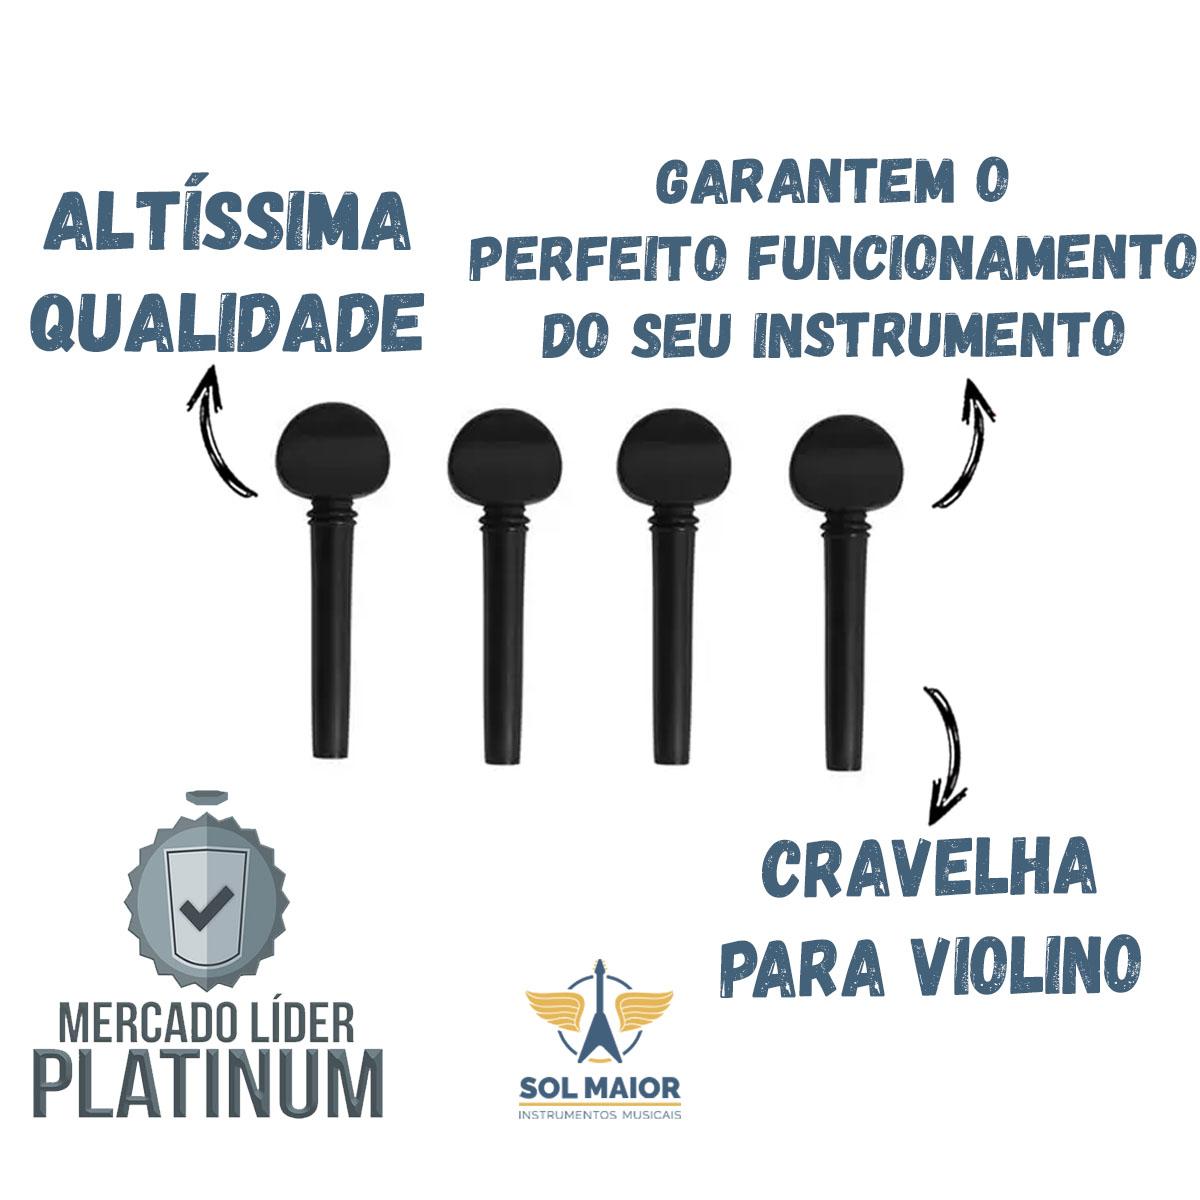 Kit com 3 Cravelha violino 4/4 Ébano Standard Dominante 8329